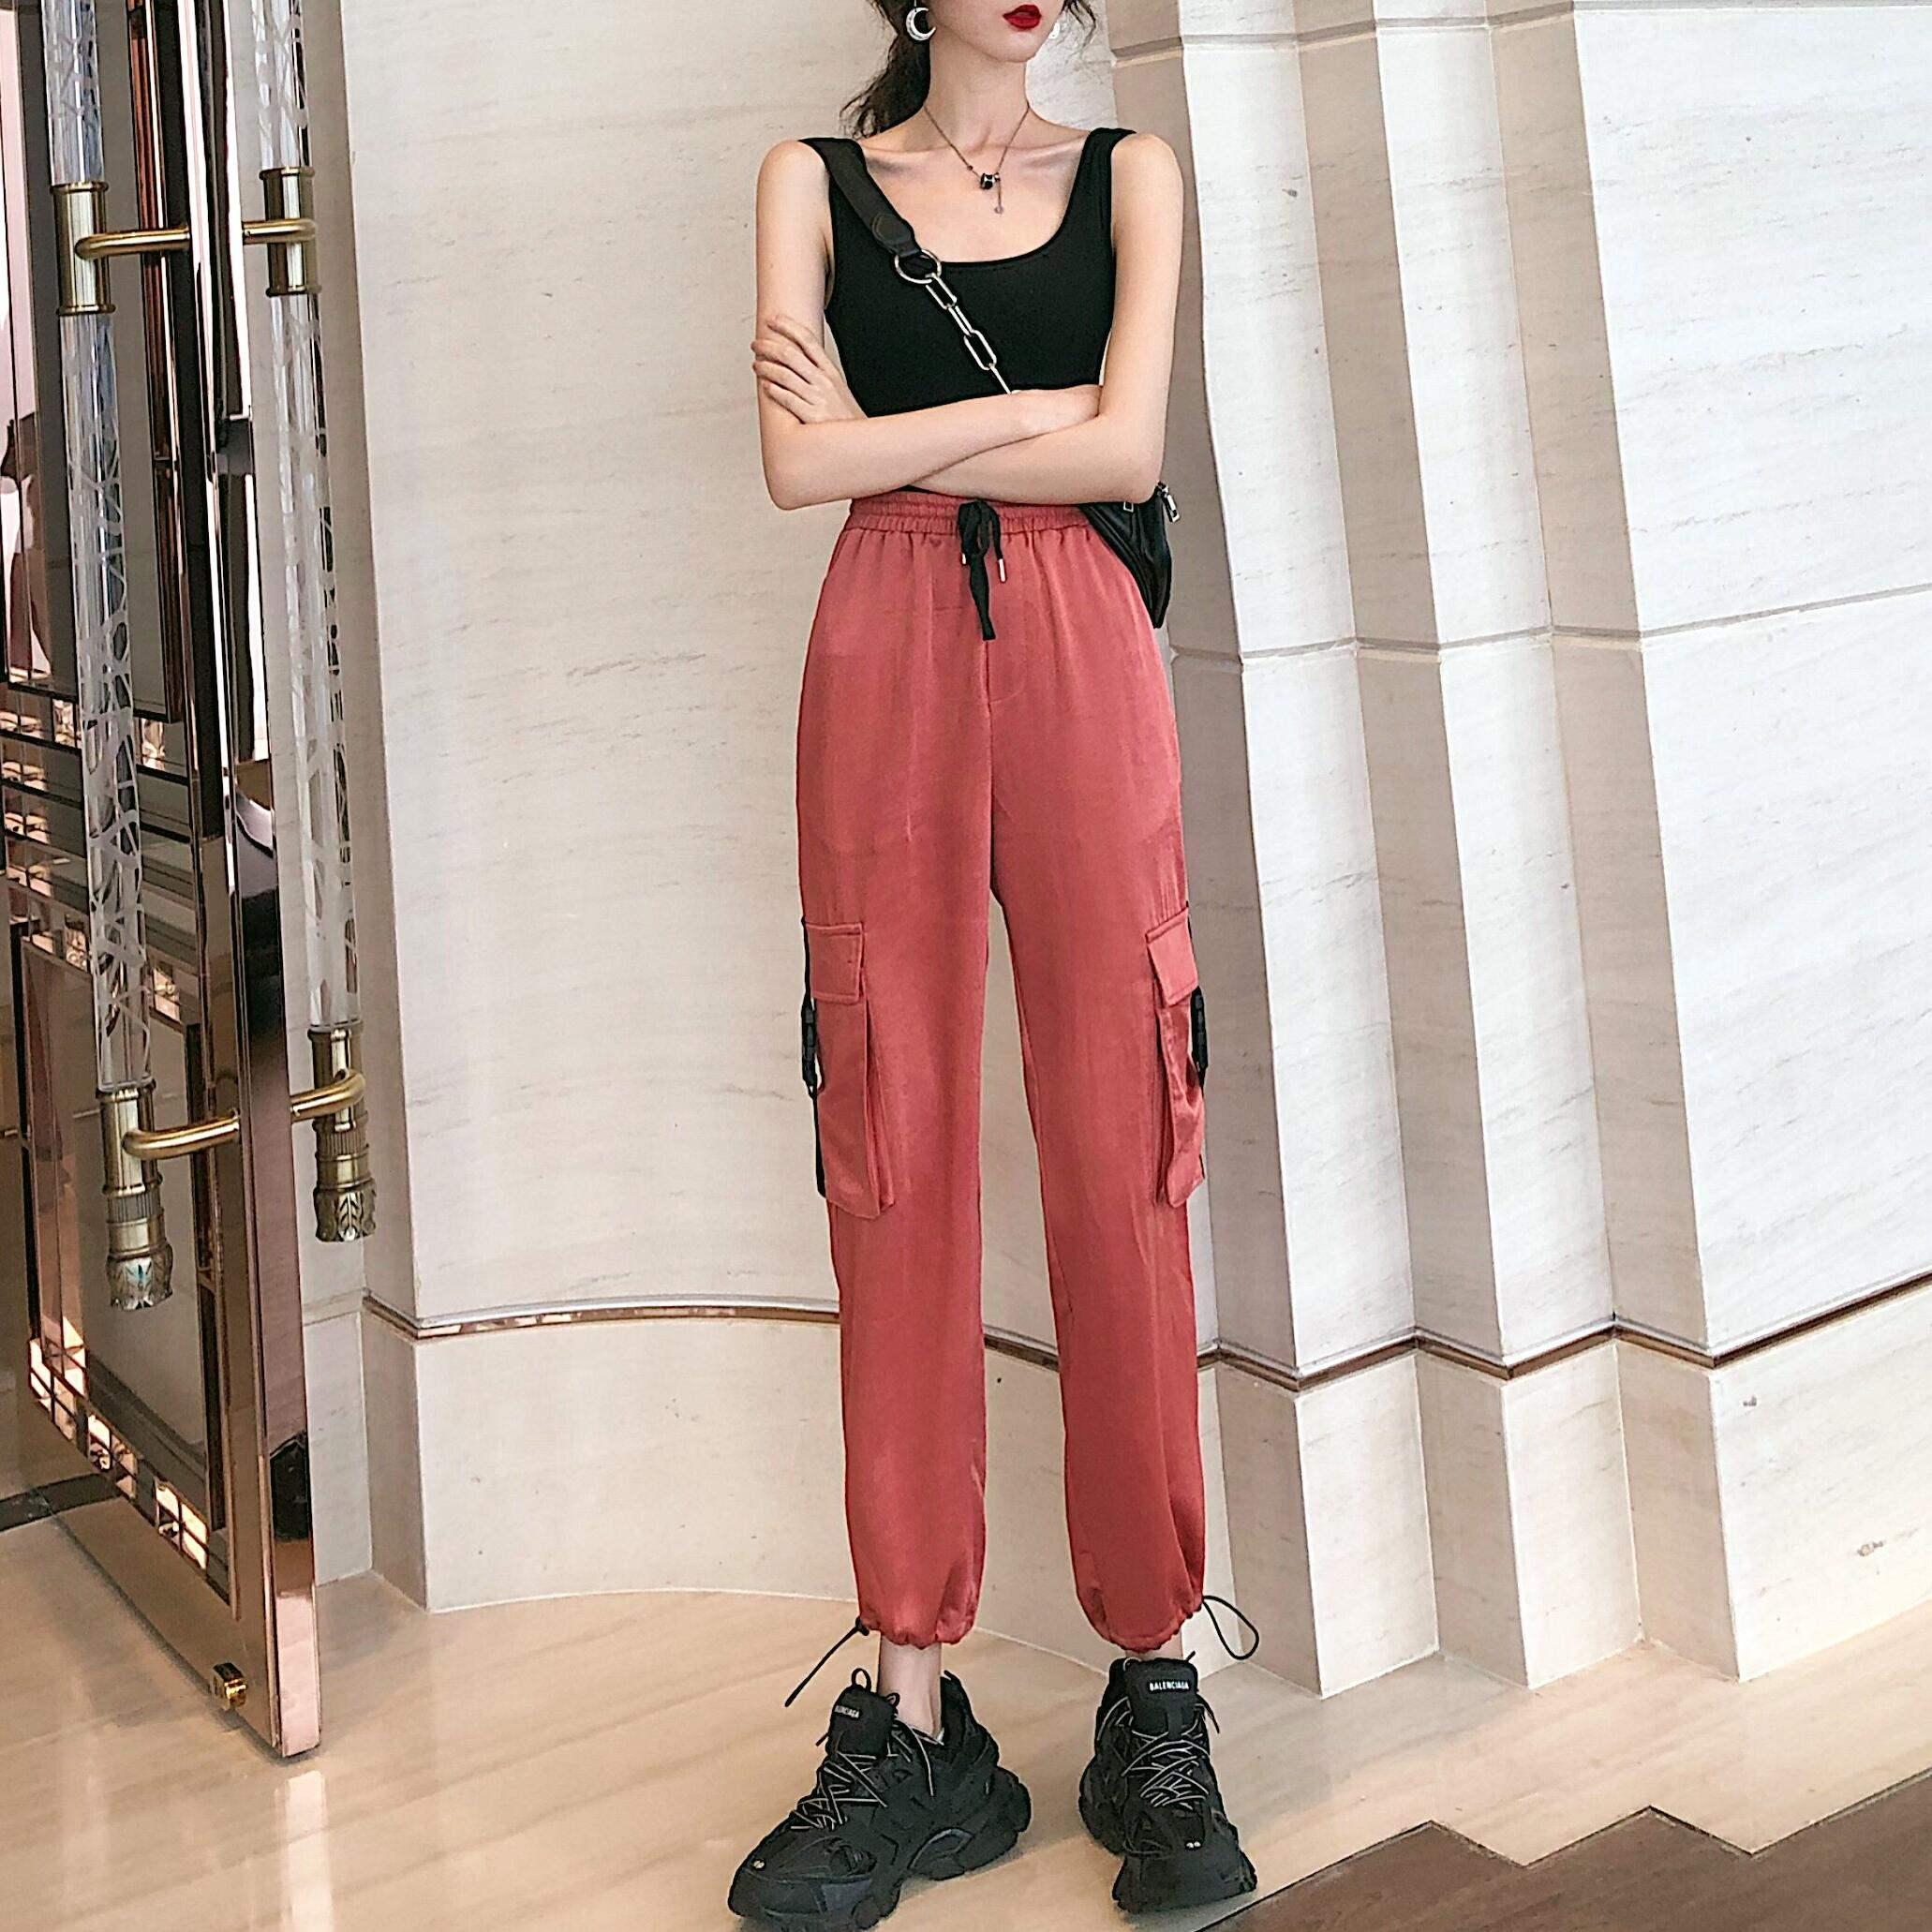 Summer 2020 new vest short casual pants suspender female + loose drawstring corset versatile suit